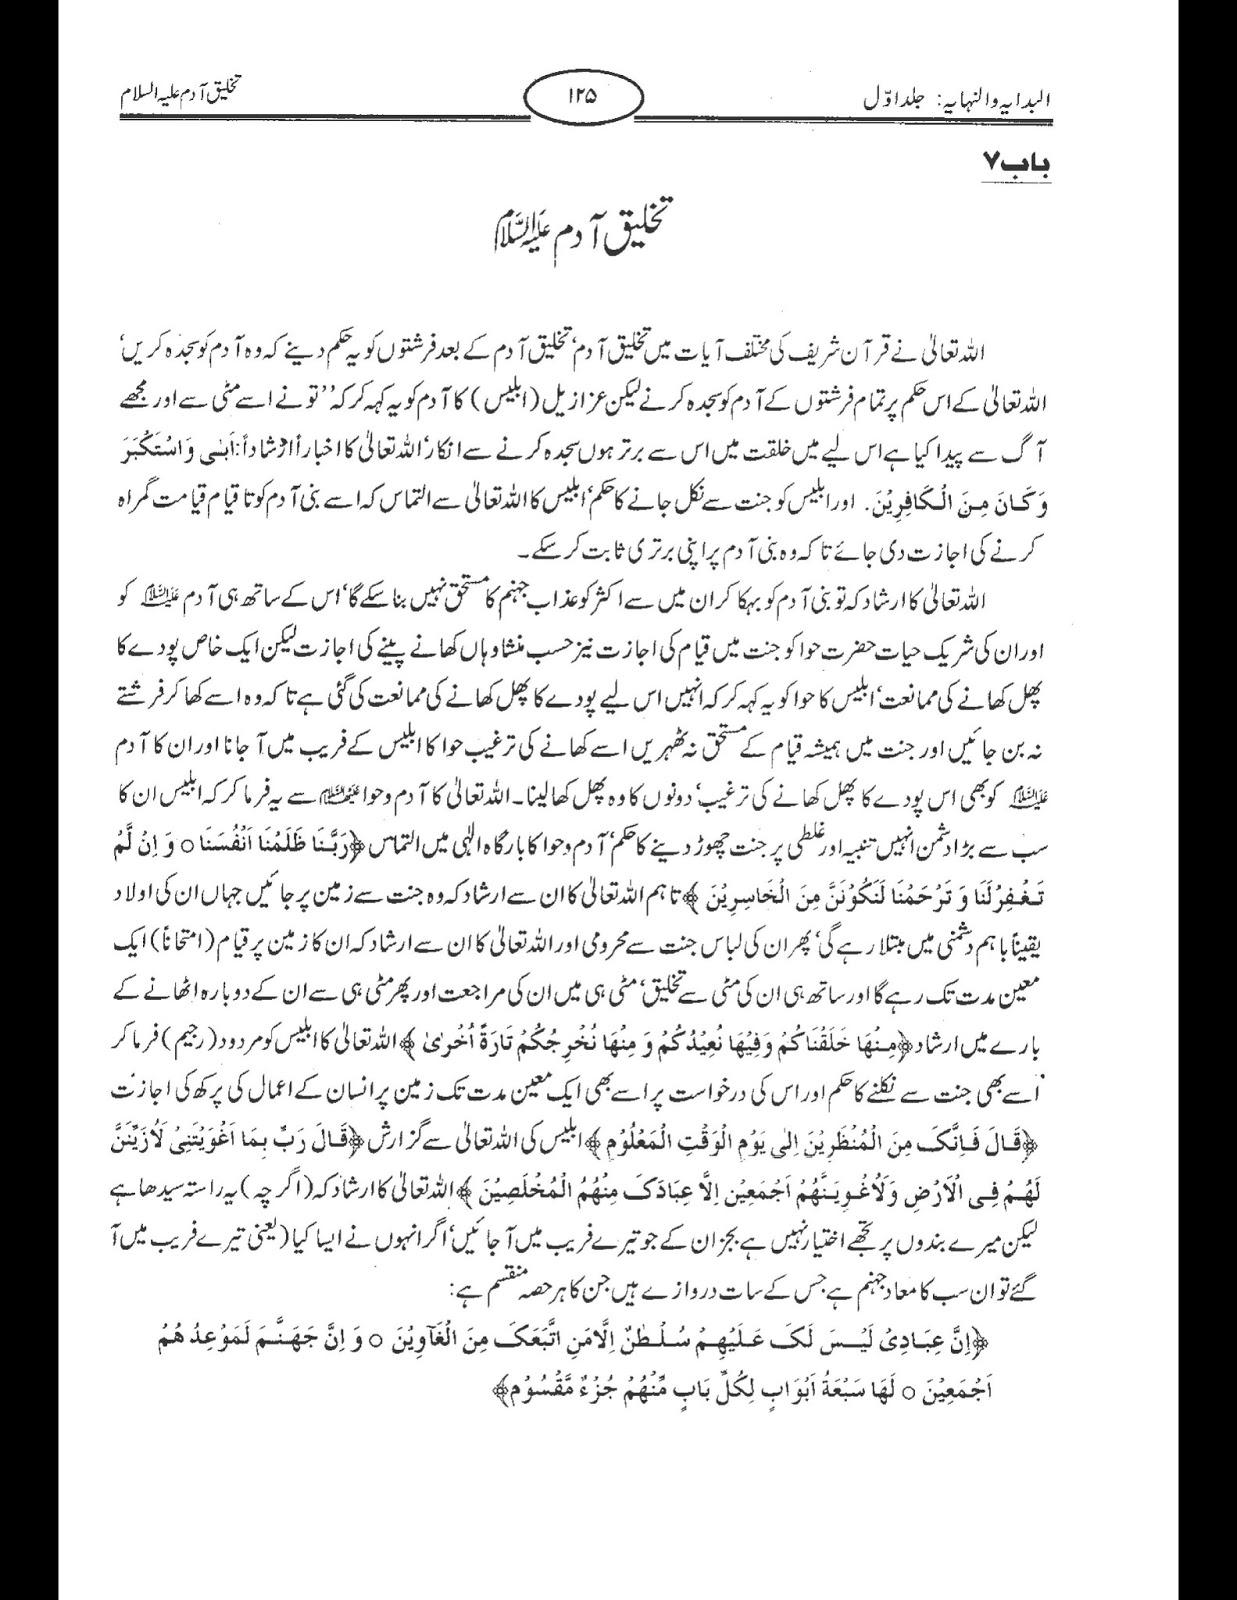 History of Adam in Urdu